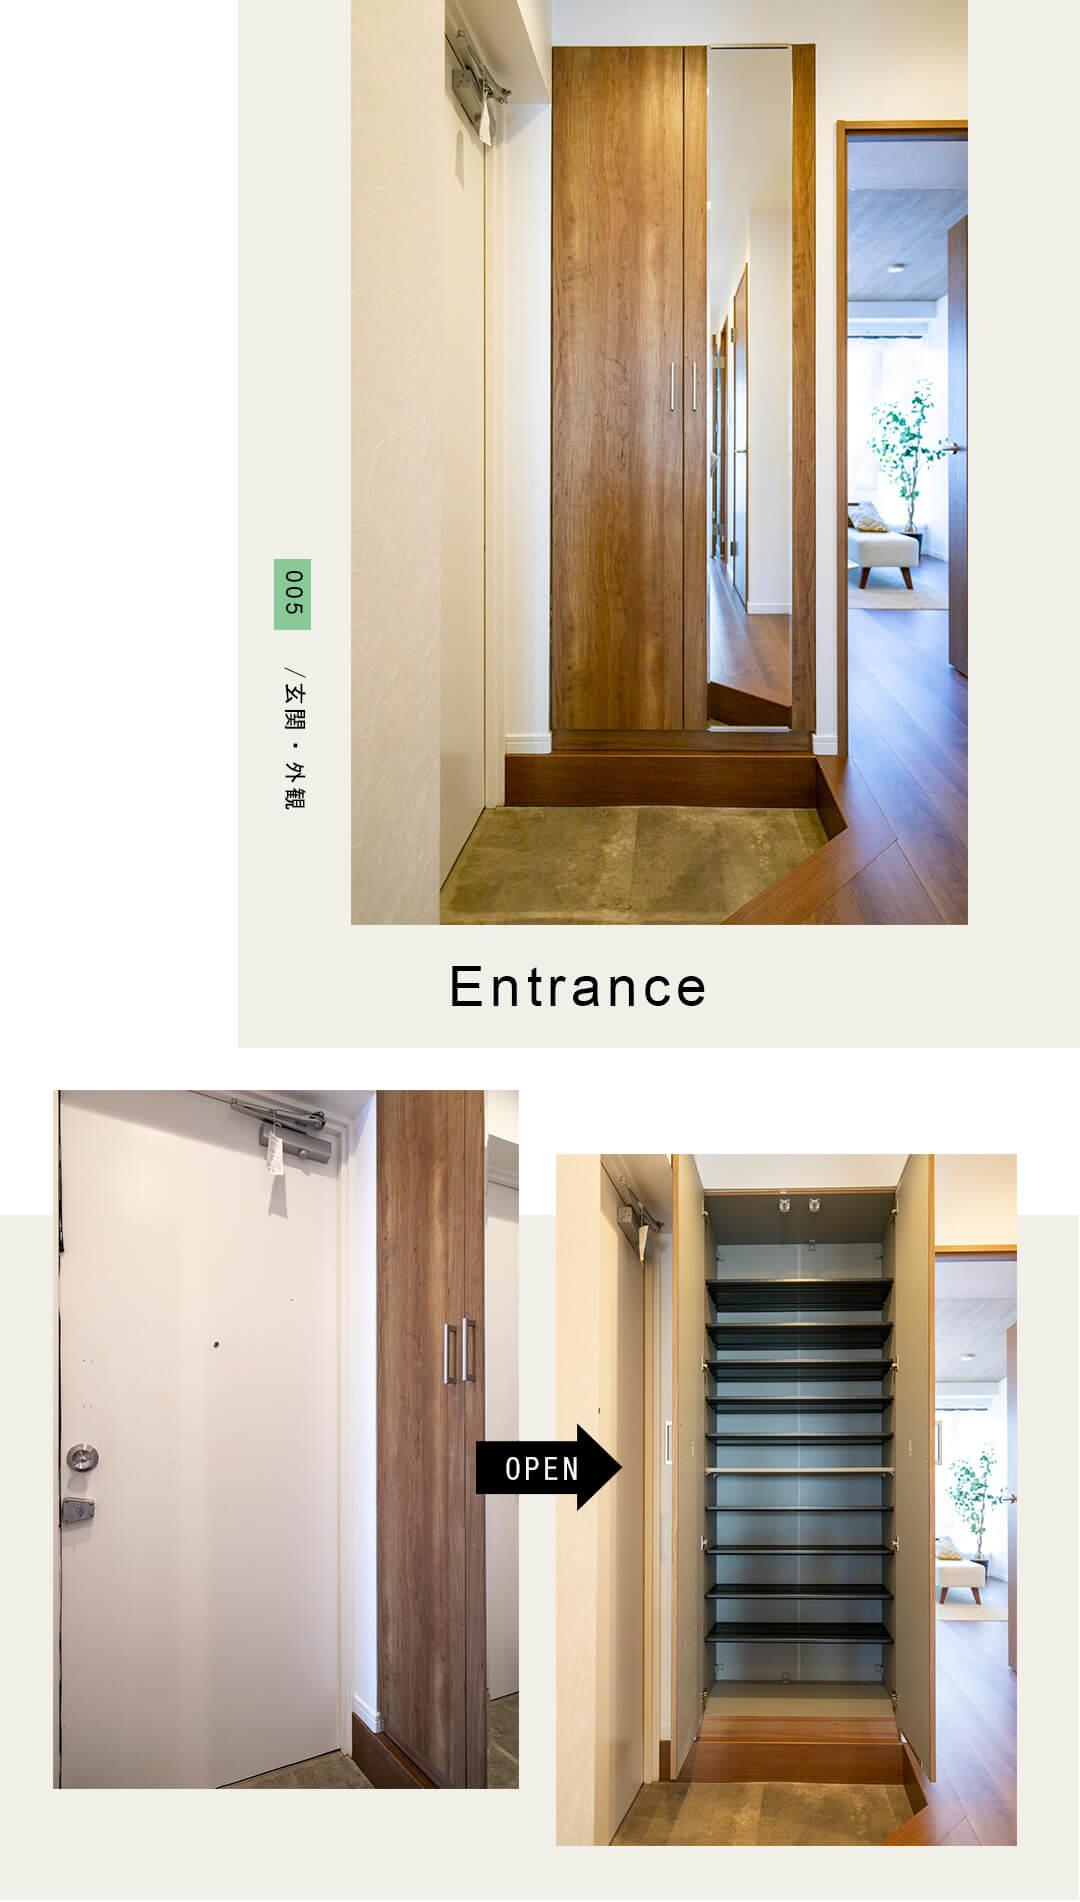 005,Entrance,玄関